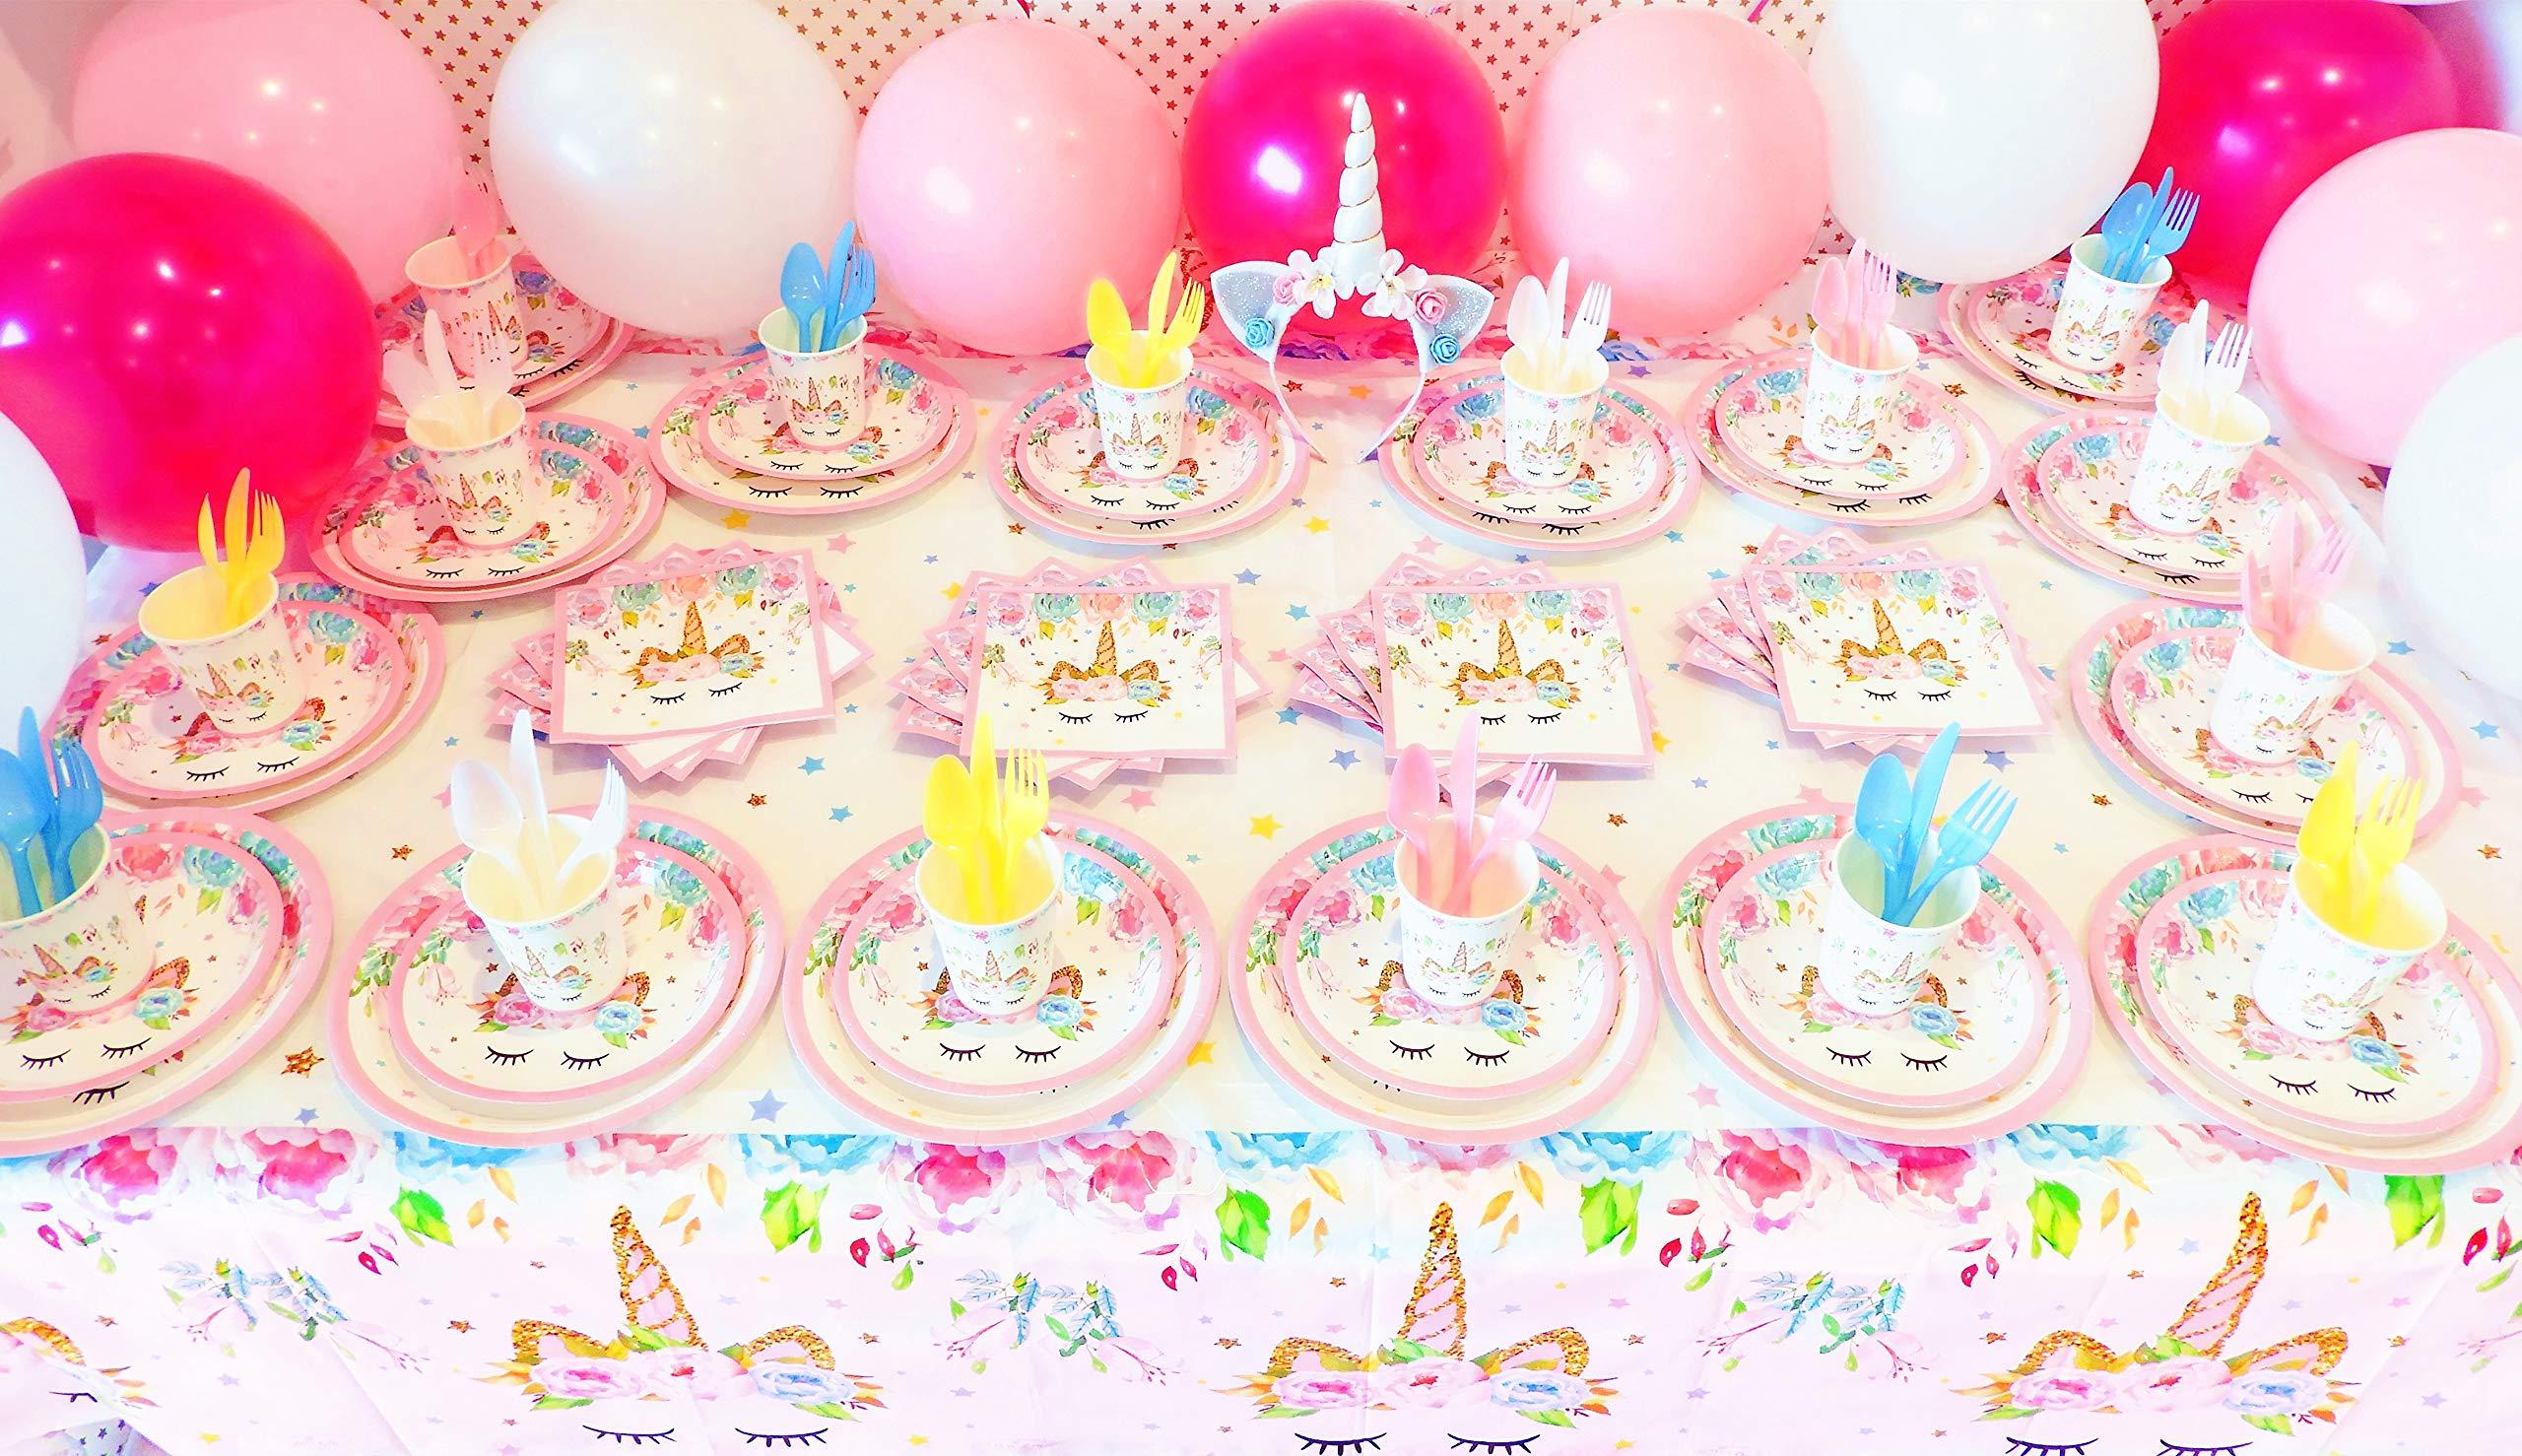 Unicorn Party Supplies Set with BONUS Glittery Unicorn Headband and 30 Balloons   145 Piece Disposable Unicorn Themed… 9